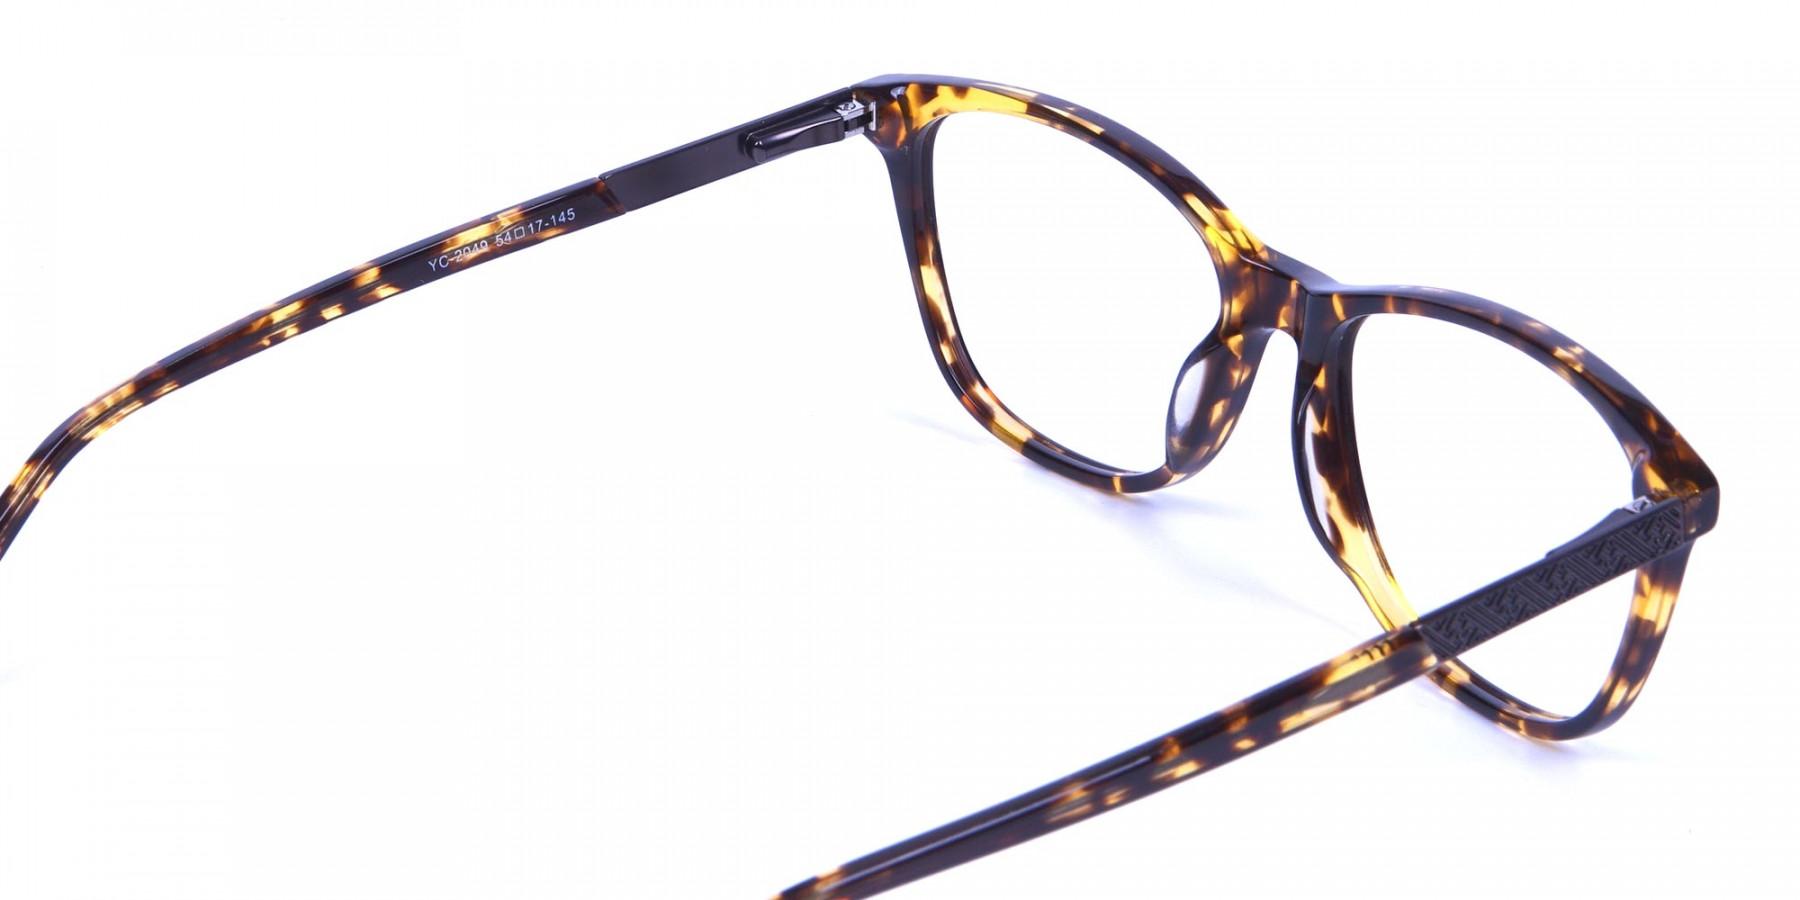 Warm-toned Glasses in Tortoiseshell